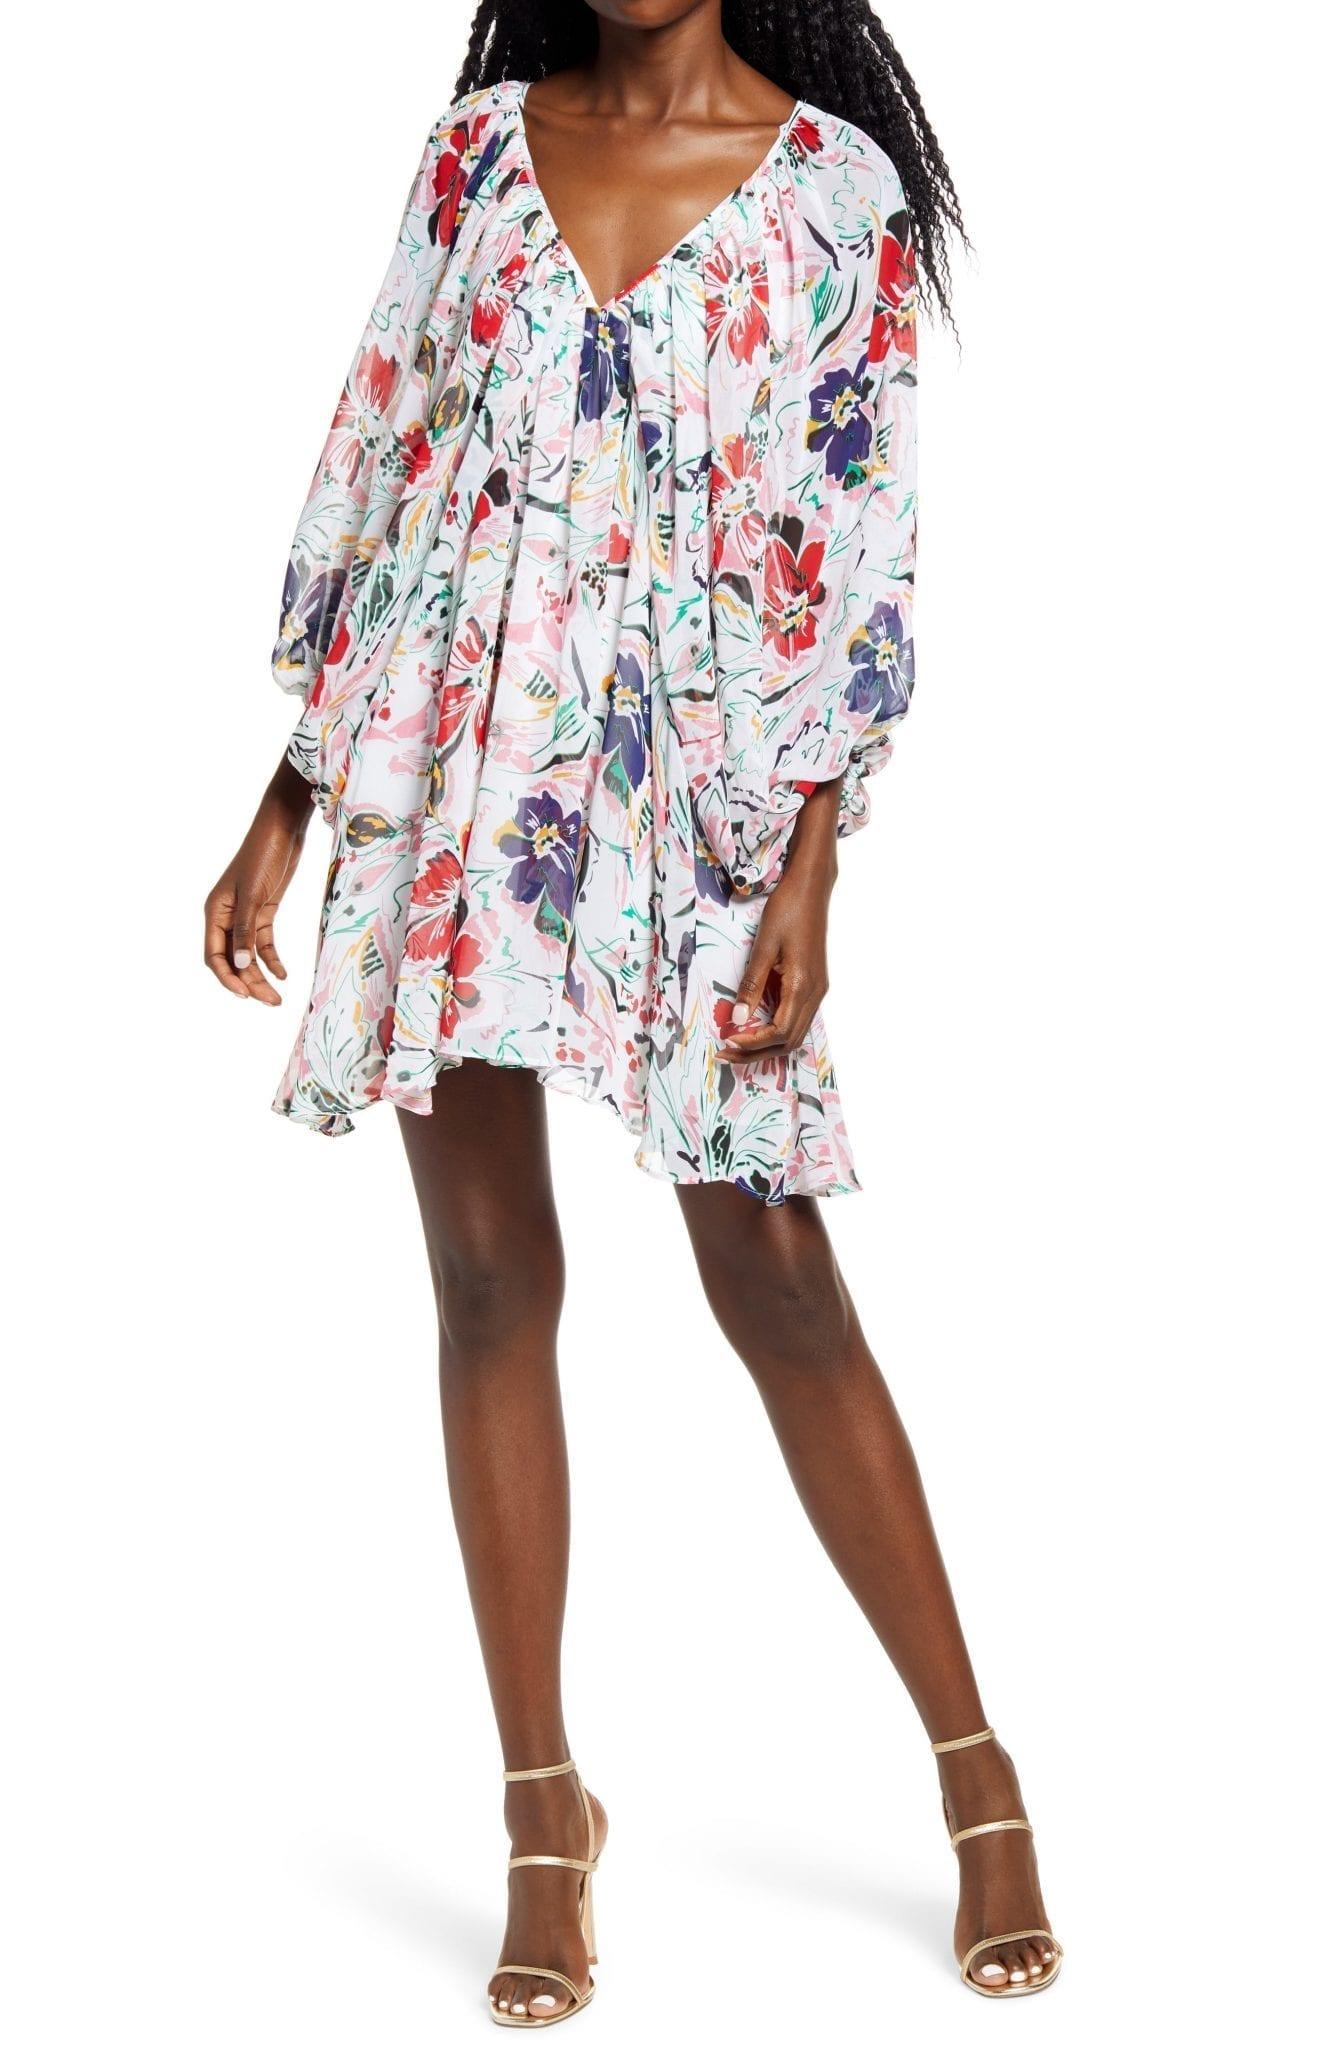 SOCIALITE Floral Print Long Sleeve Mini Dress